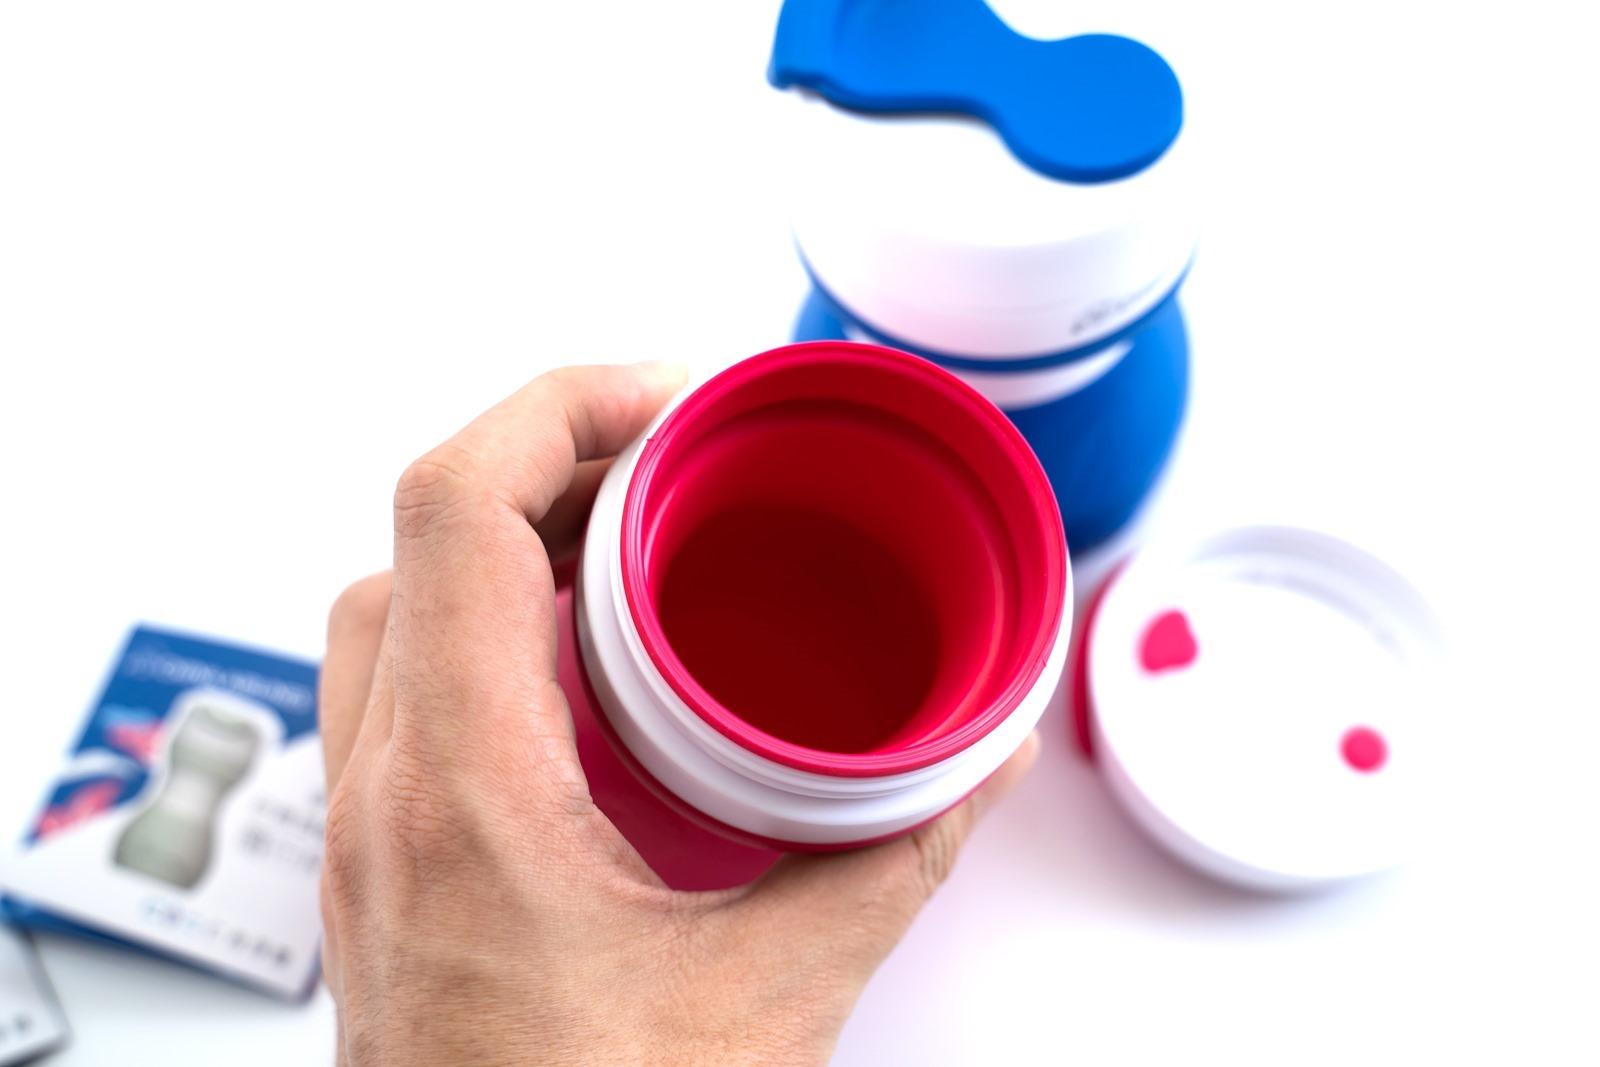 華航推出新款可上飛機杯「矽緻摺疊隨行杯」開箱分享!( China Airlines Foldable Platium Silicone cups set unboxing) @3C 達人廖阿輝